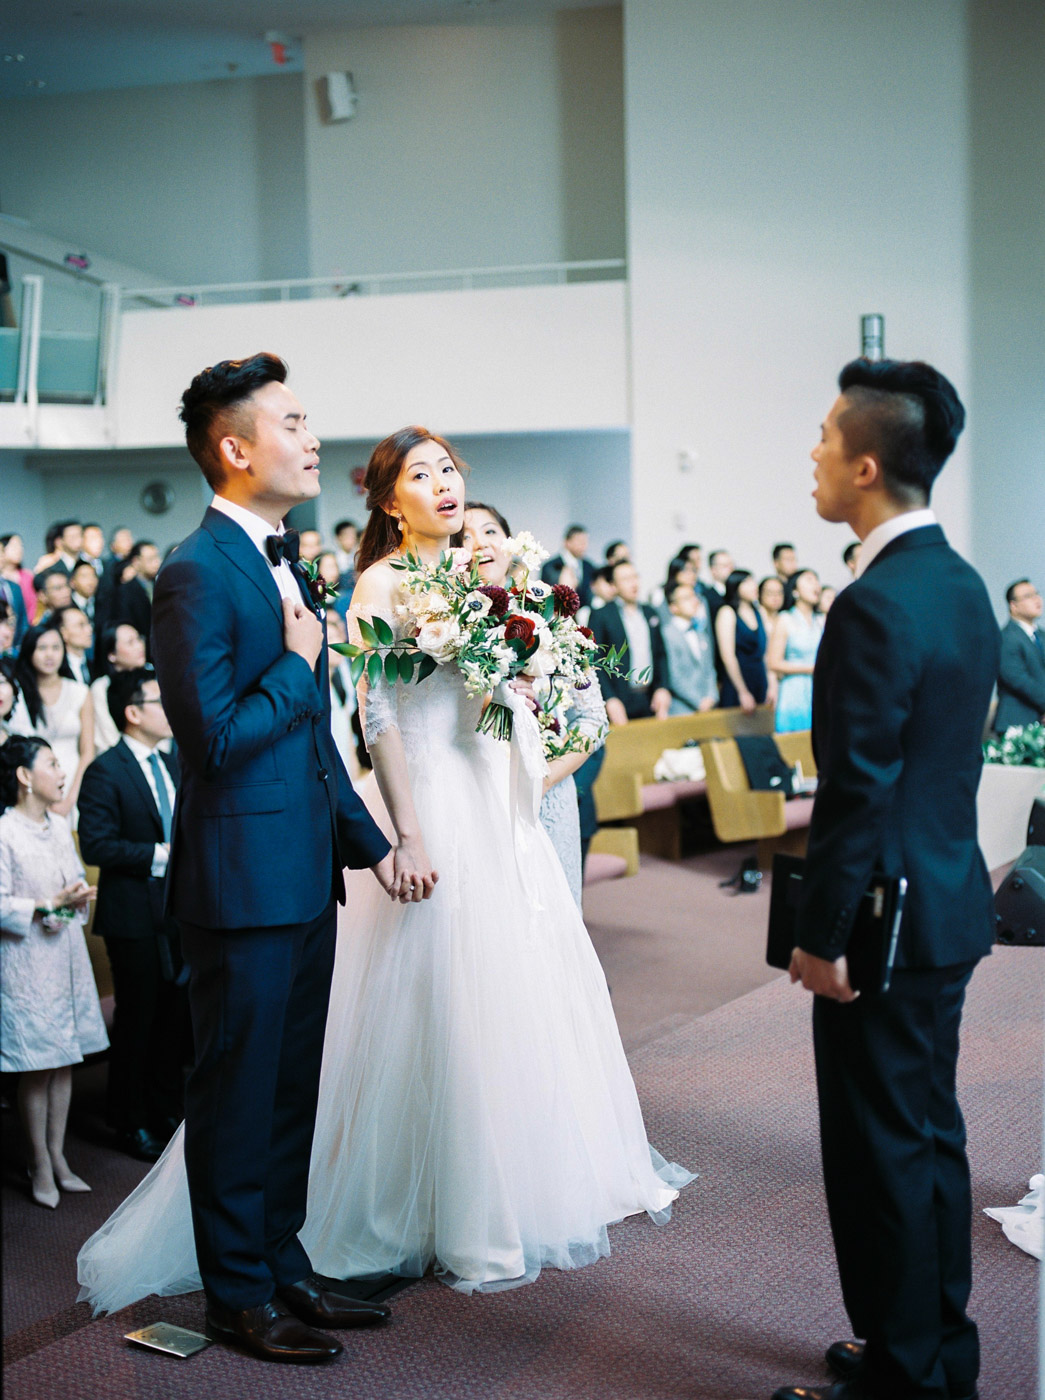 wedding_photography_tips_best_photography_lighting-14.jpg